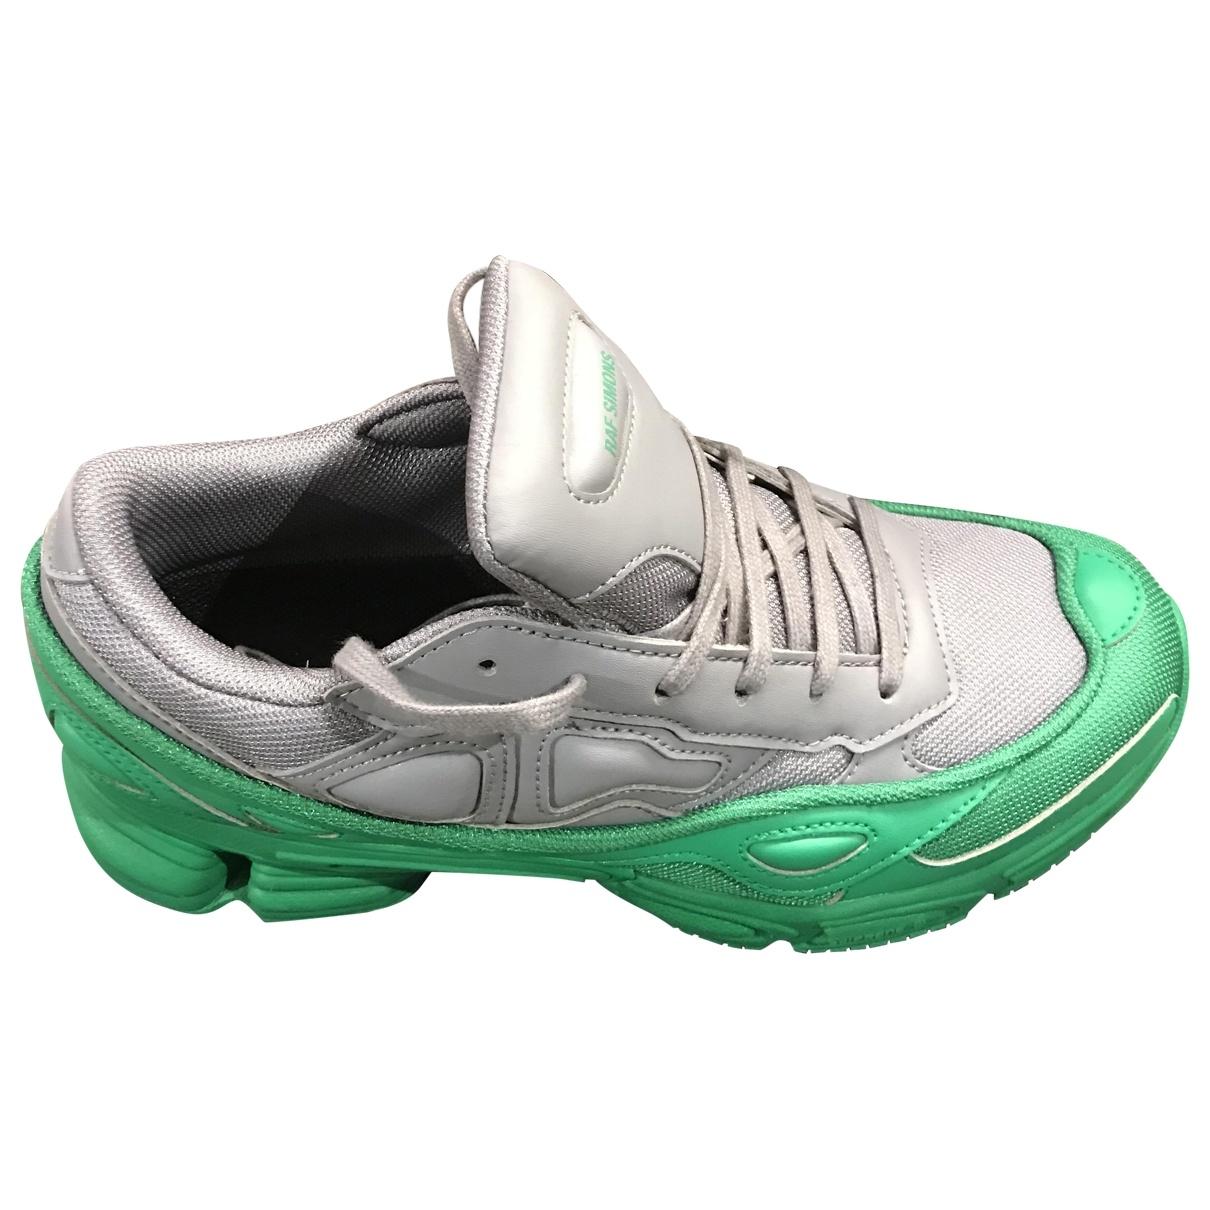 Adidas X Raf Simons RS Ozweego Sneakers in  Grau Leder